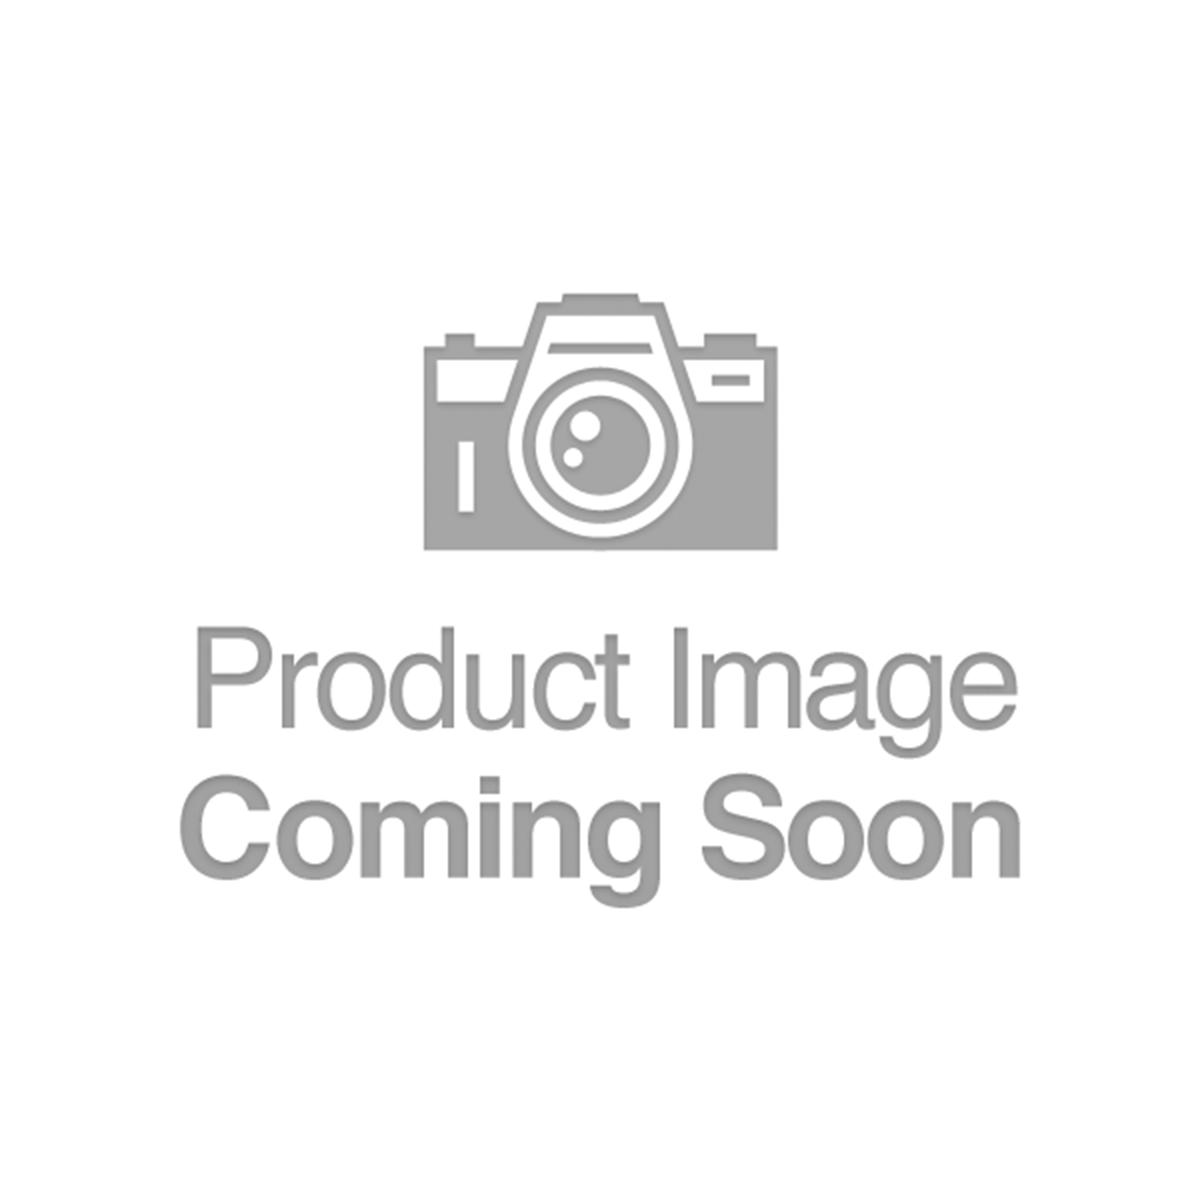 Chase City - Virginia - CH 9291 - FR 600 - VF